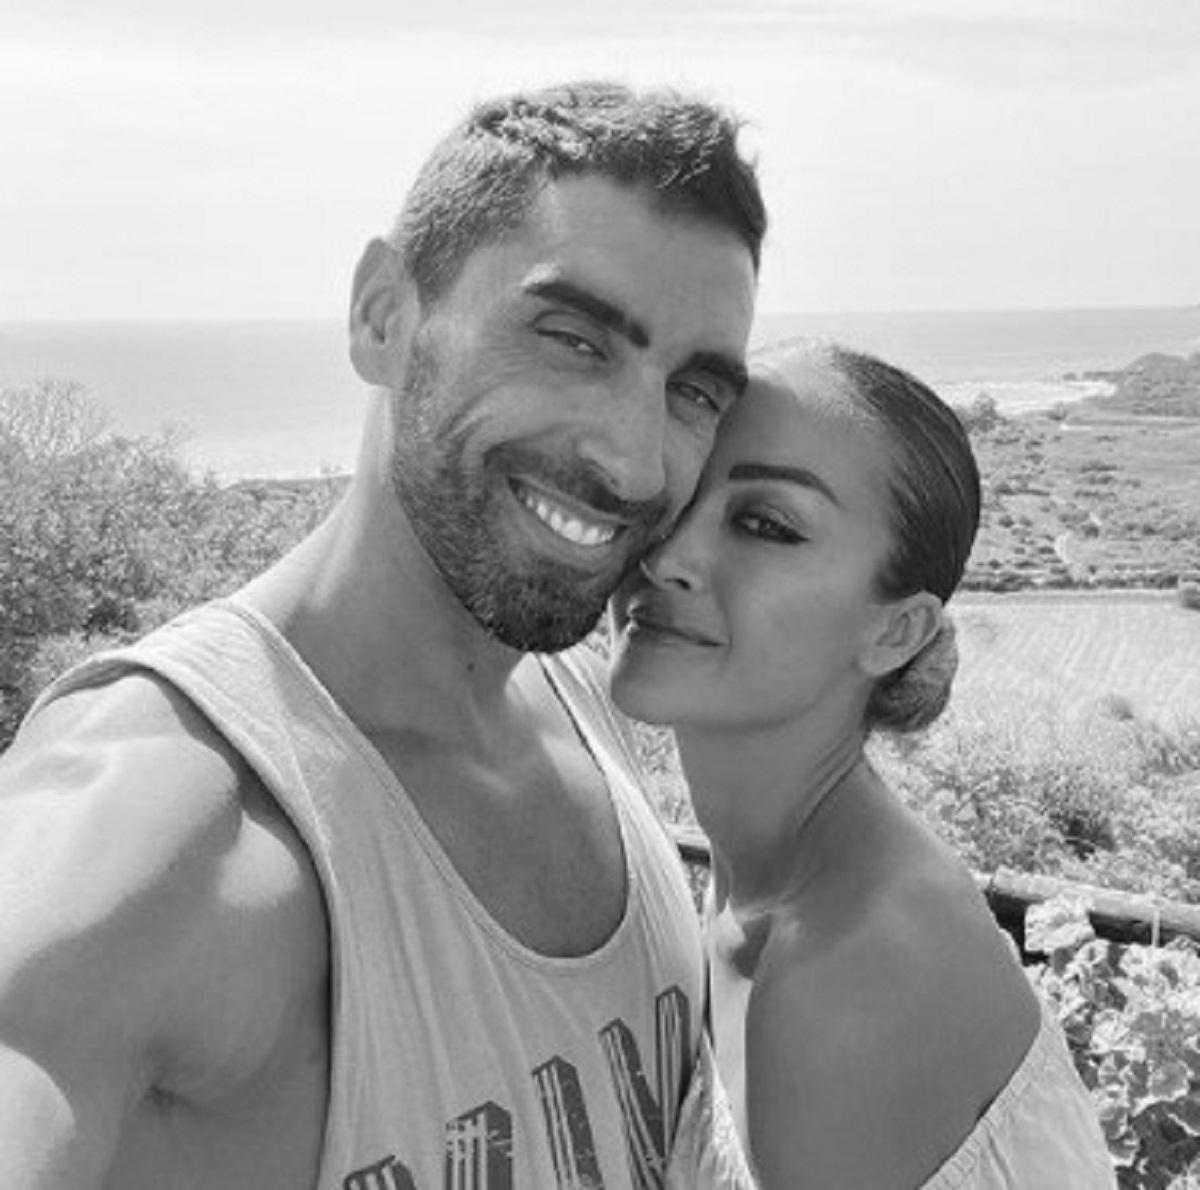 Giorgia Palmas Filippo Magnini racconto primo bacio